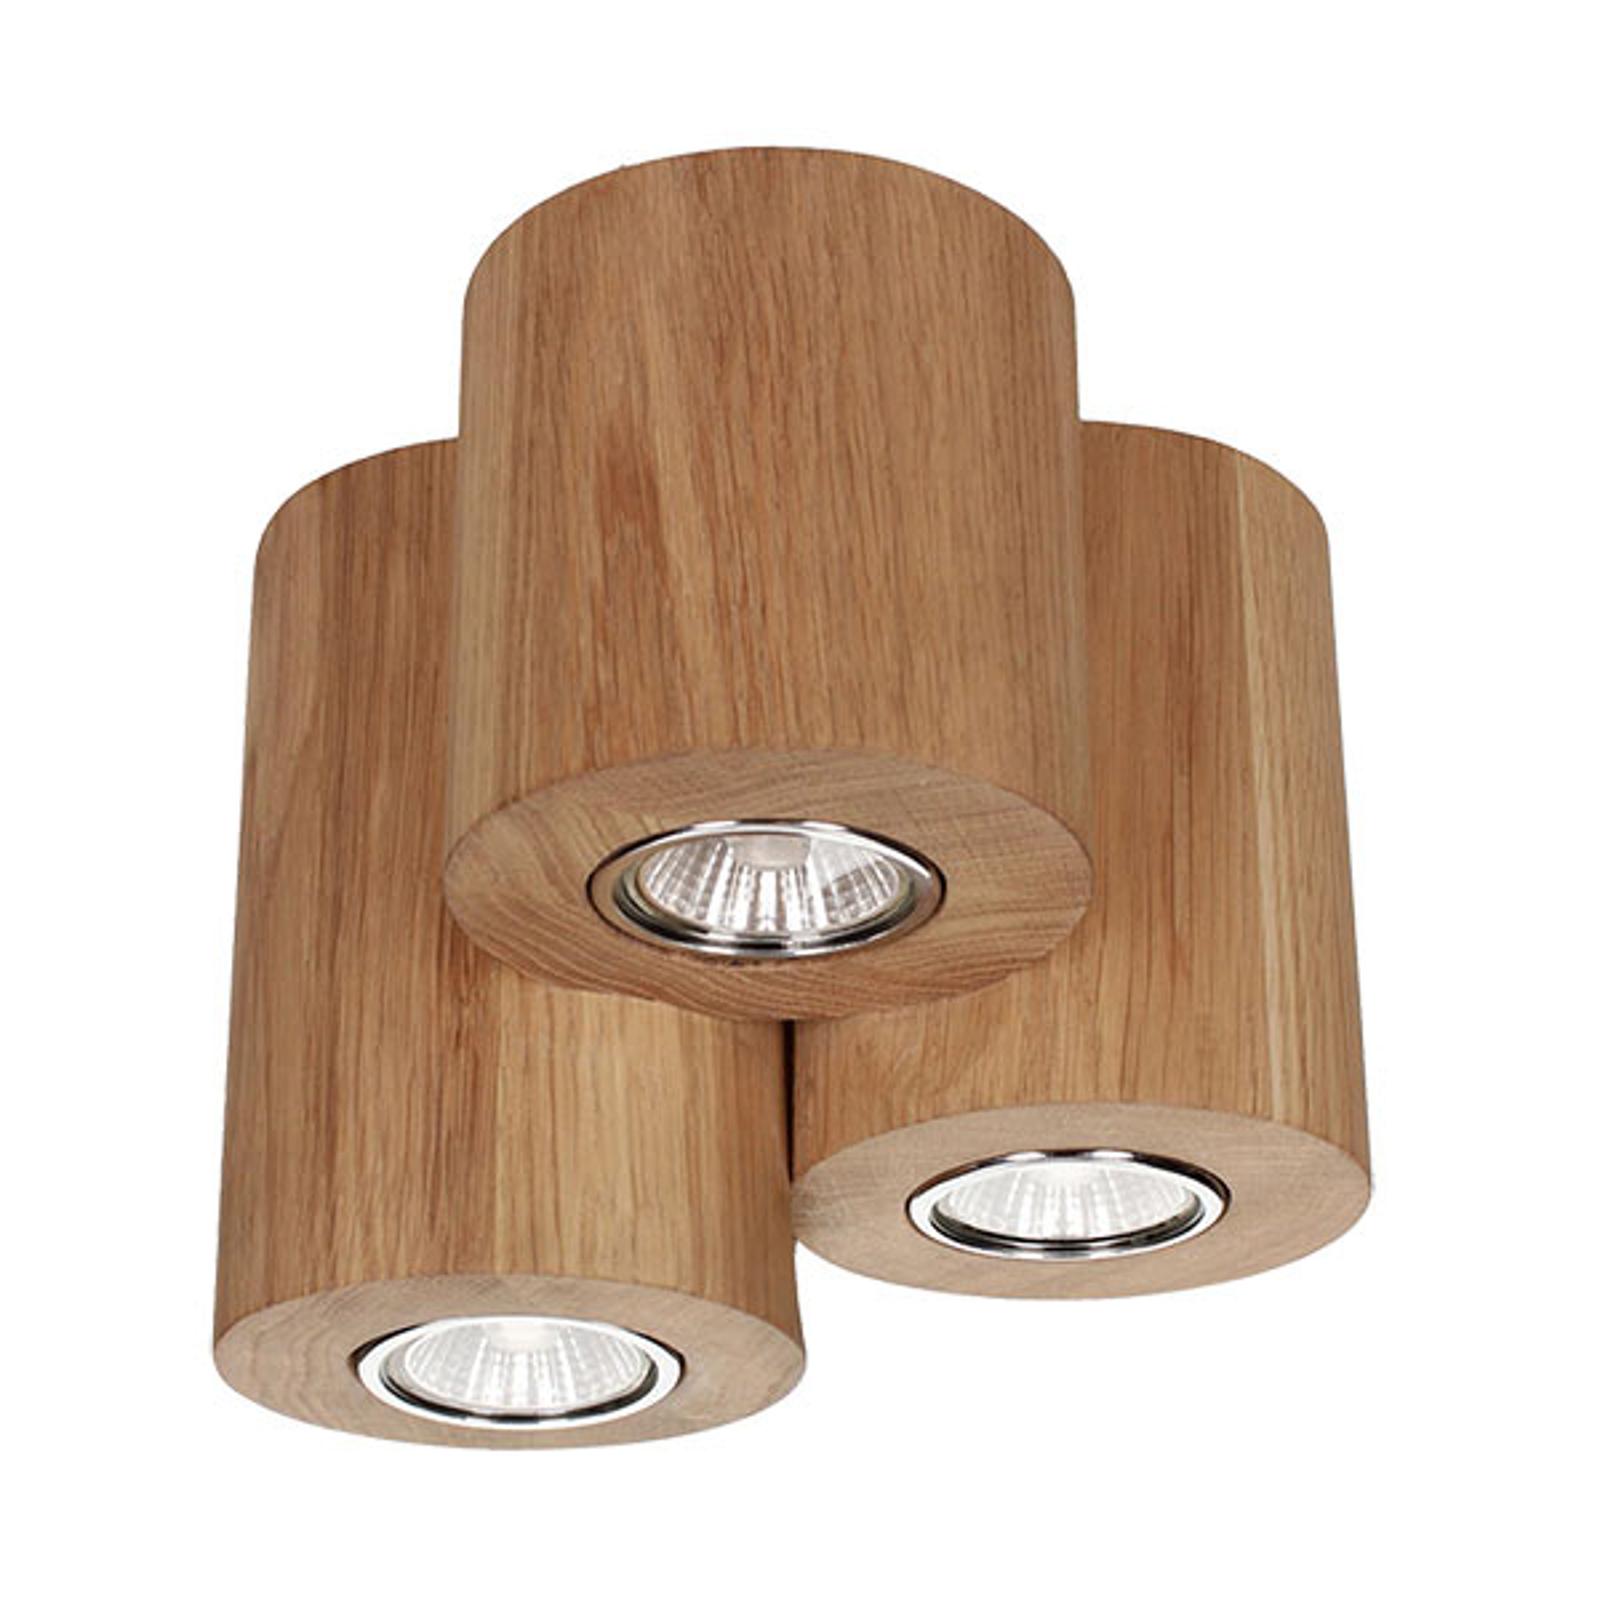 Taklampa Wooddream 3 lampor ek, rund